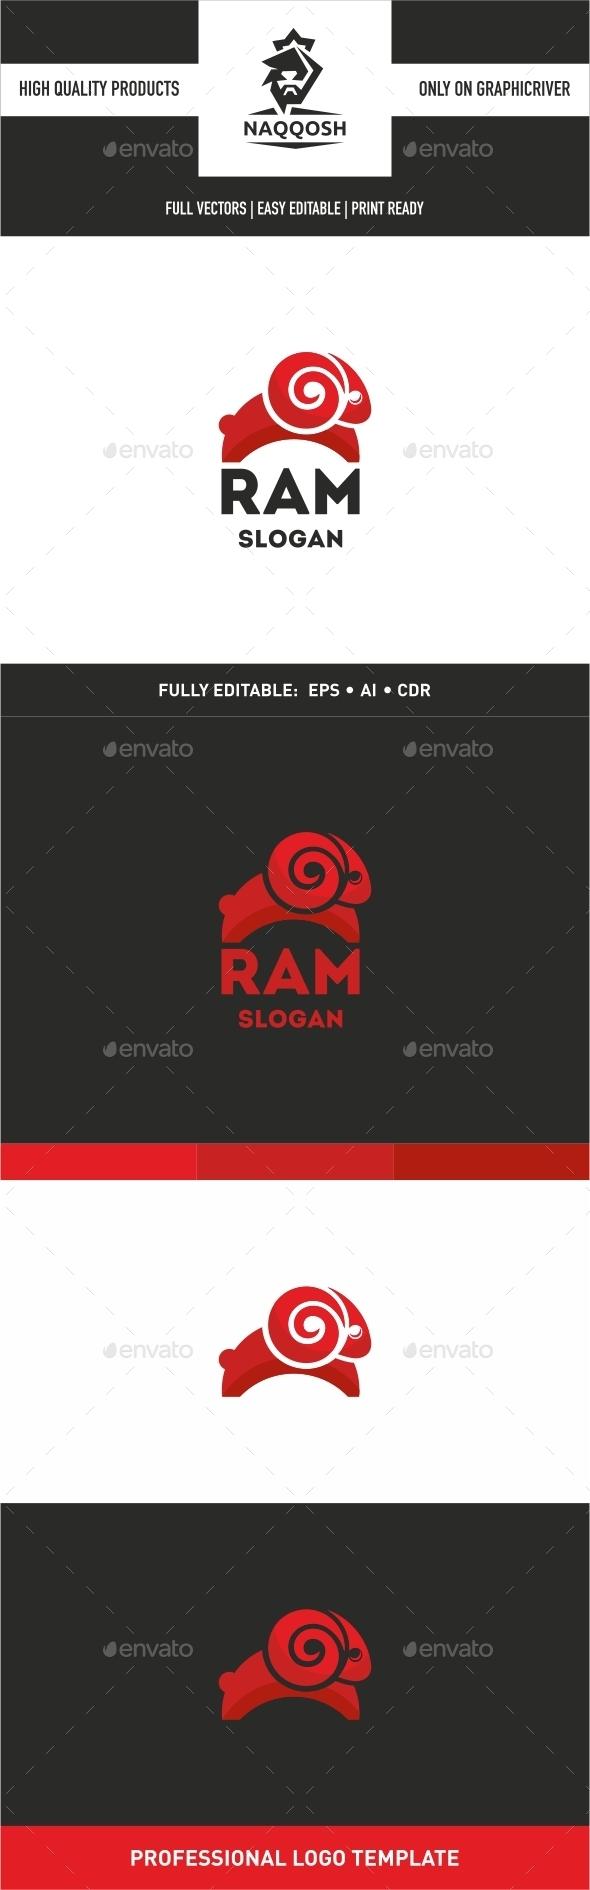 GraphicRiver Ram 9911409